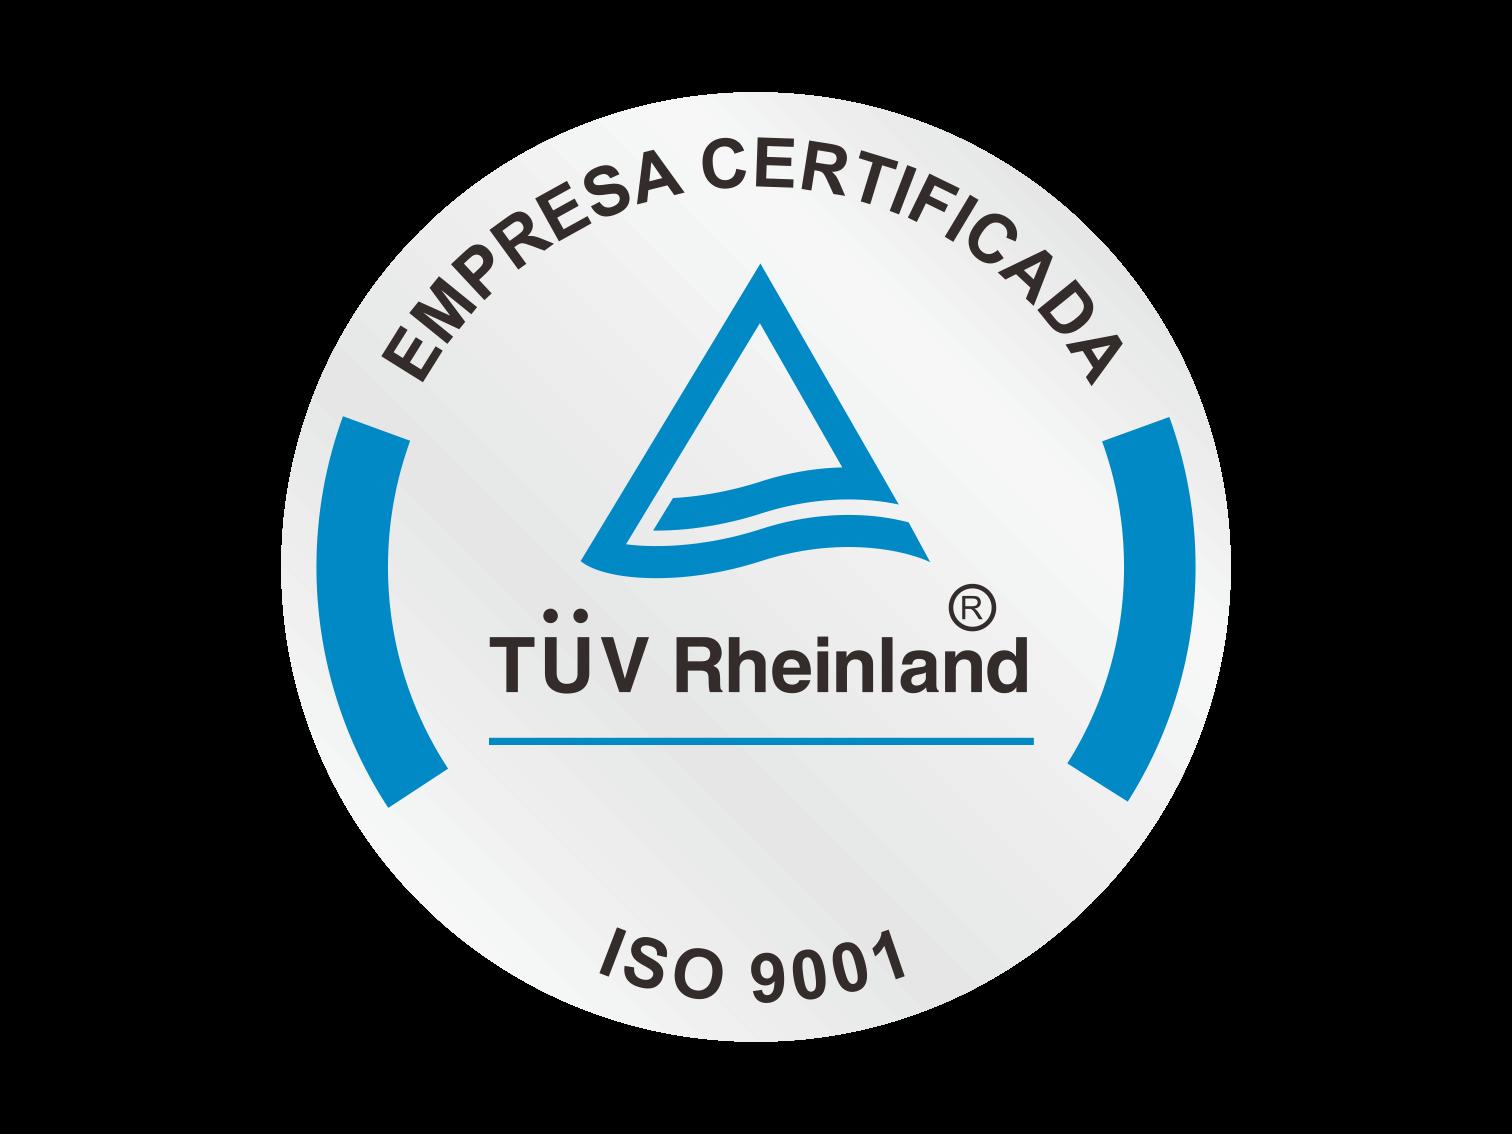 Logo Certification Iso Vector Cdr Png Hd Gudril Logo Tempat